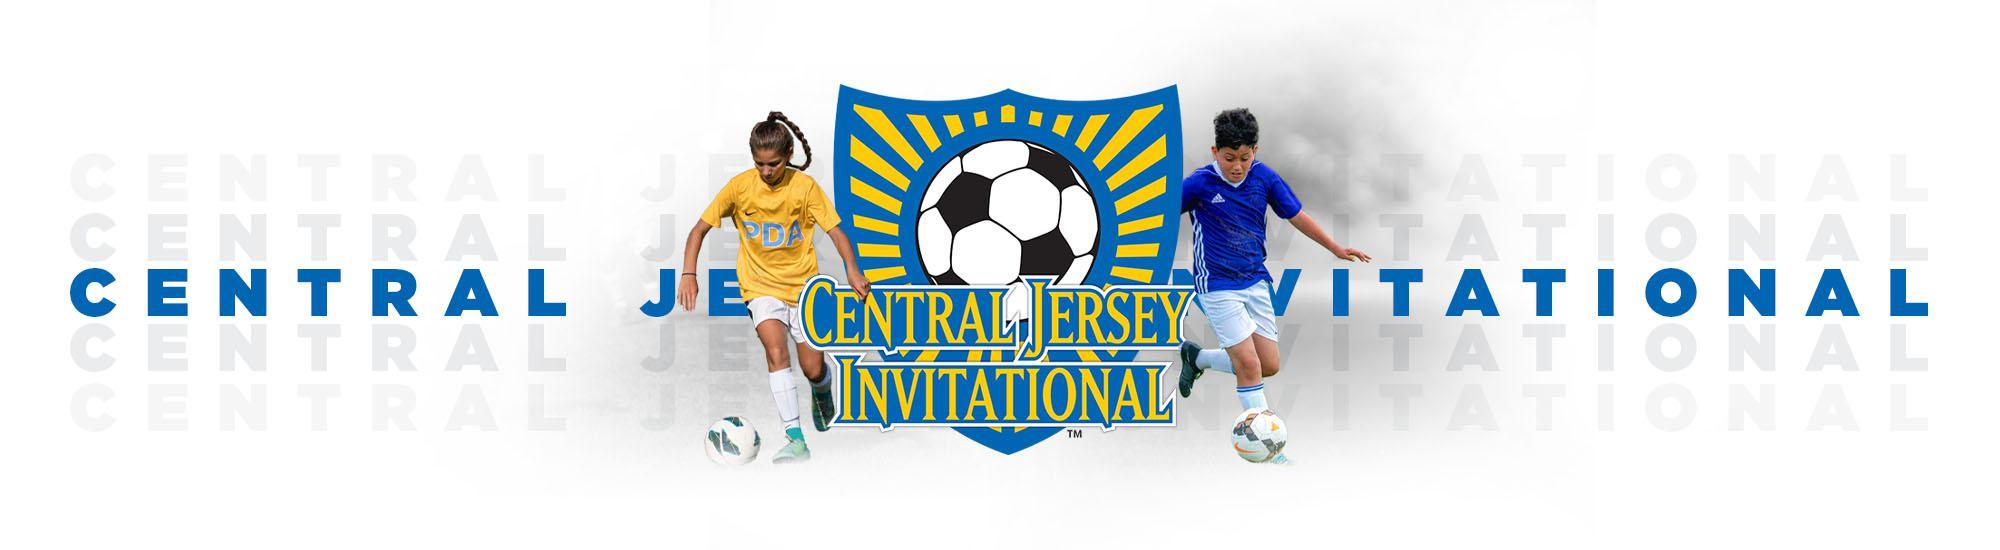 EDP Central Jersey Invitational